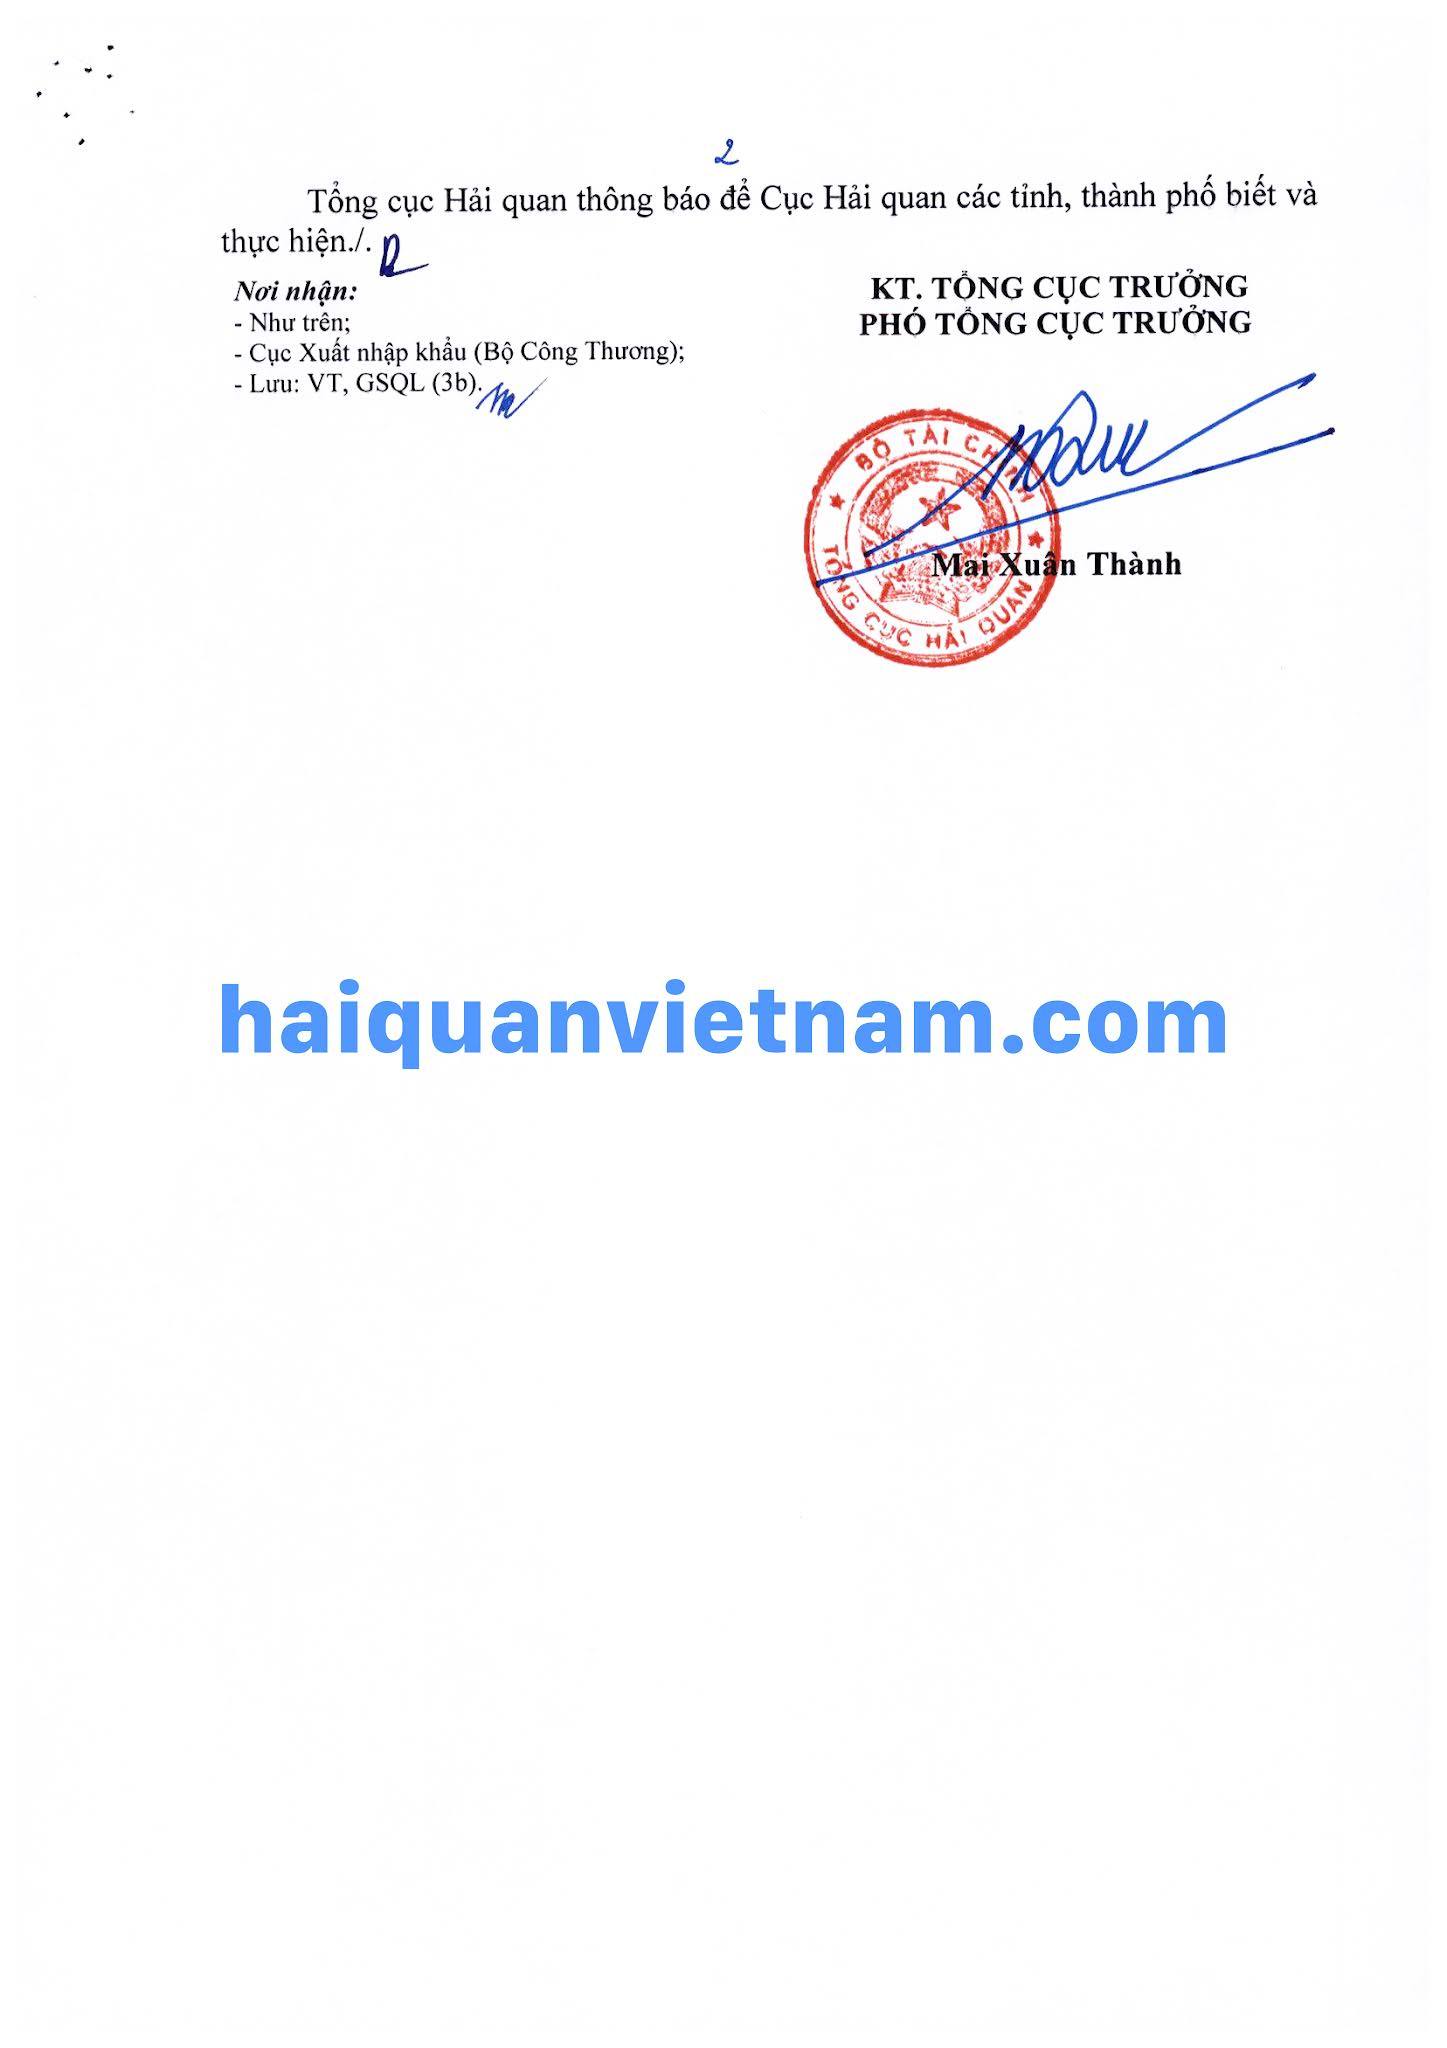 [Image: 210729%2B-%2B3795-TCHQ-GSQL_haiquanvietnam_02.jpg]